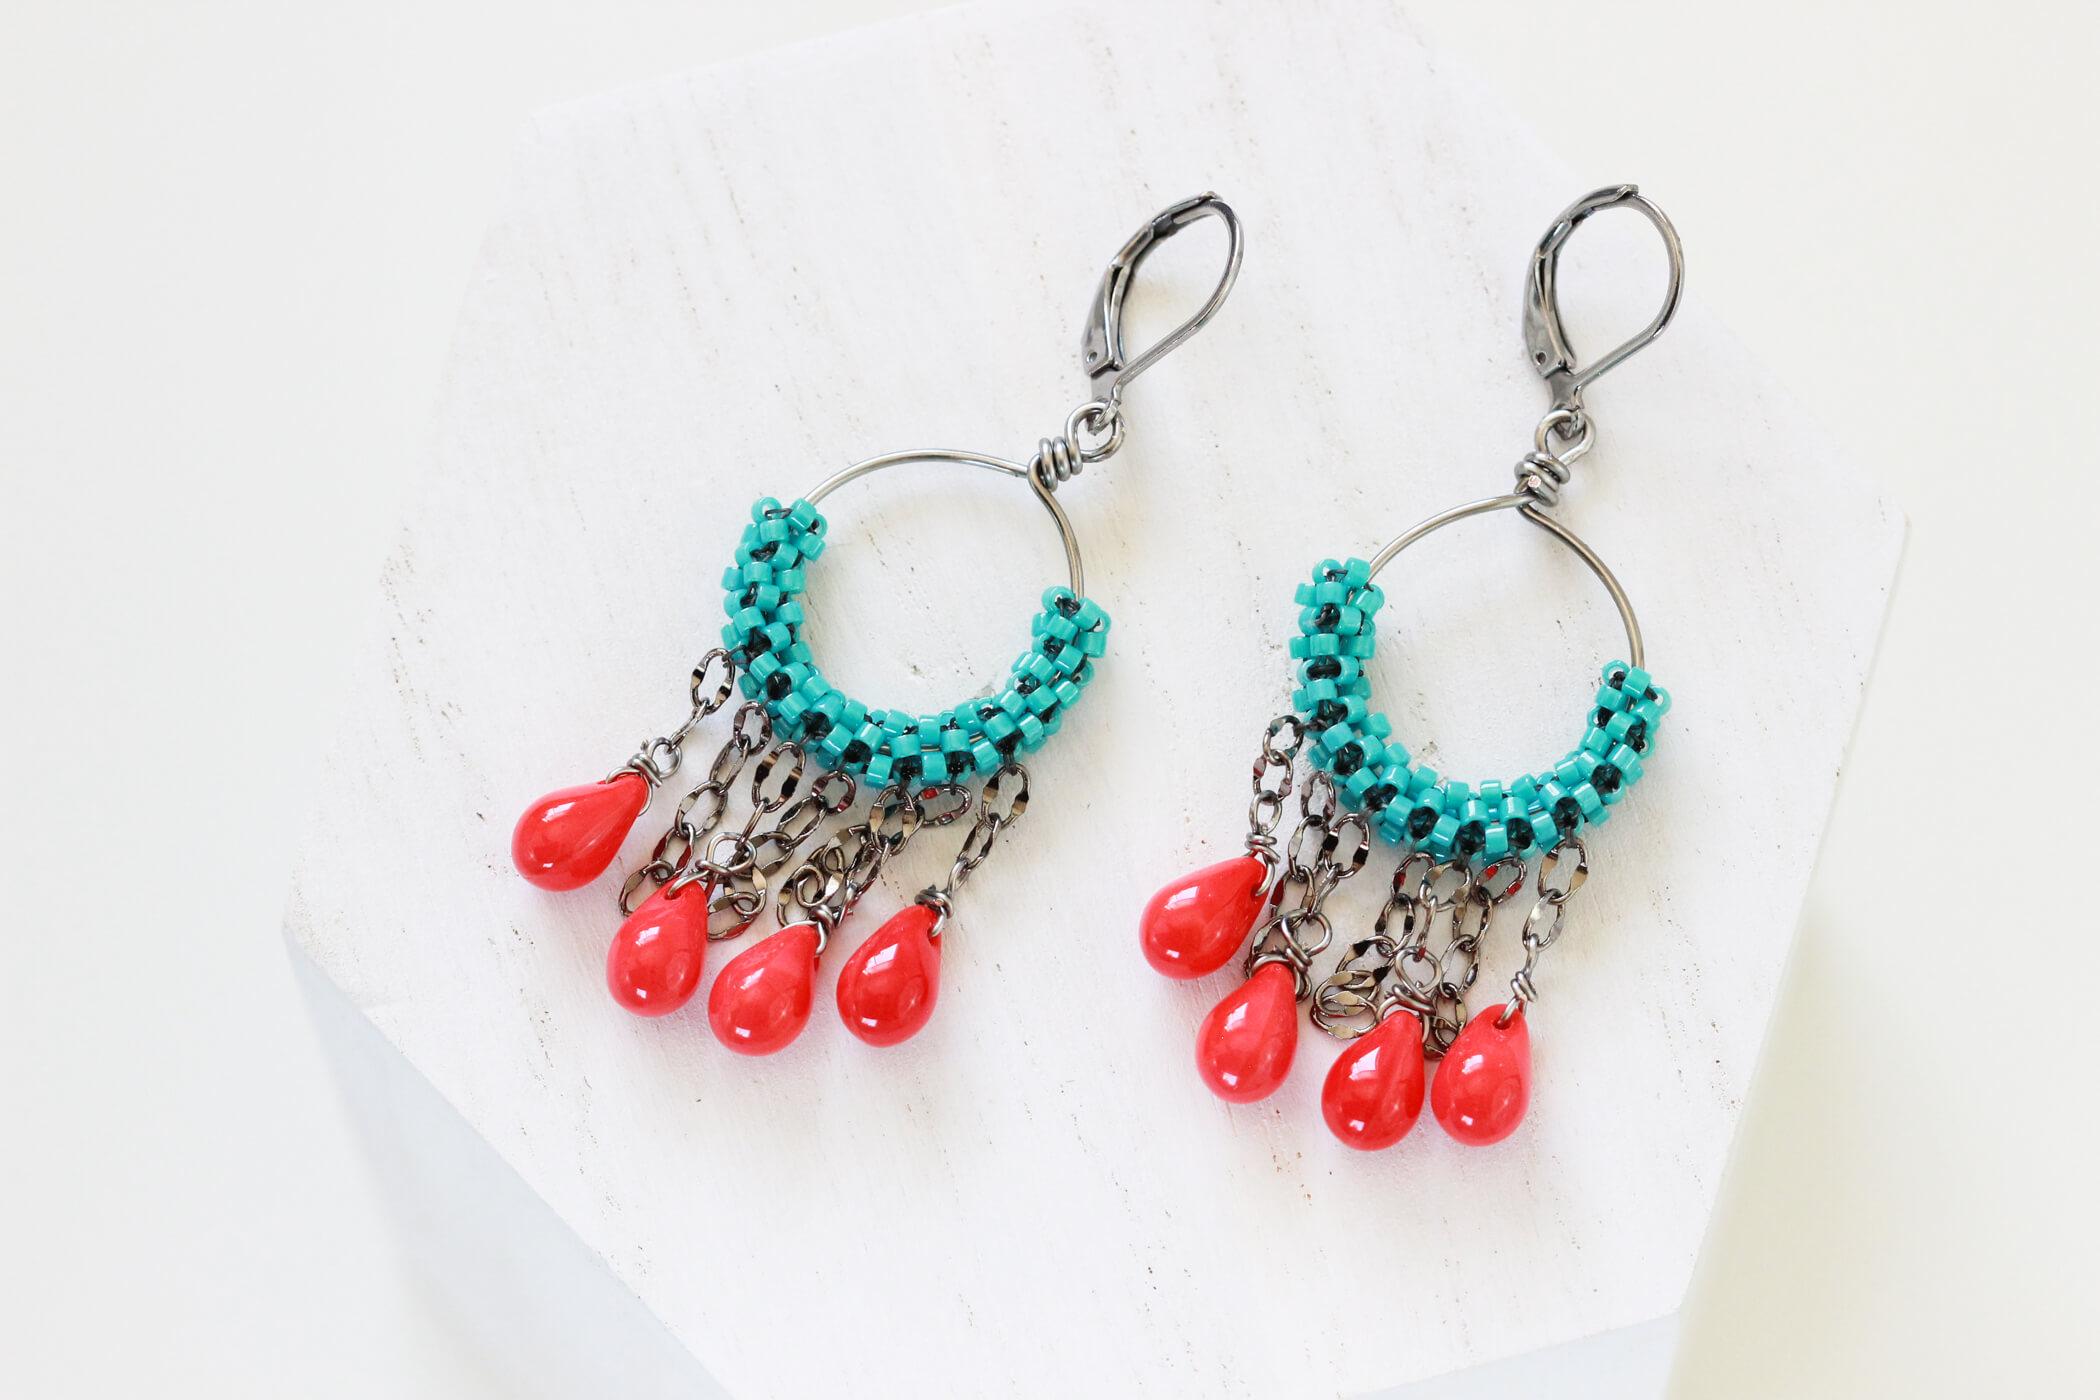 Turquoise Hoop Earrings – Handmade Designer Jewelry by Kaleidoscopes And Polka Dots